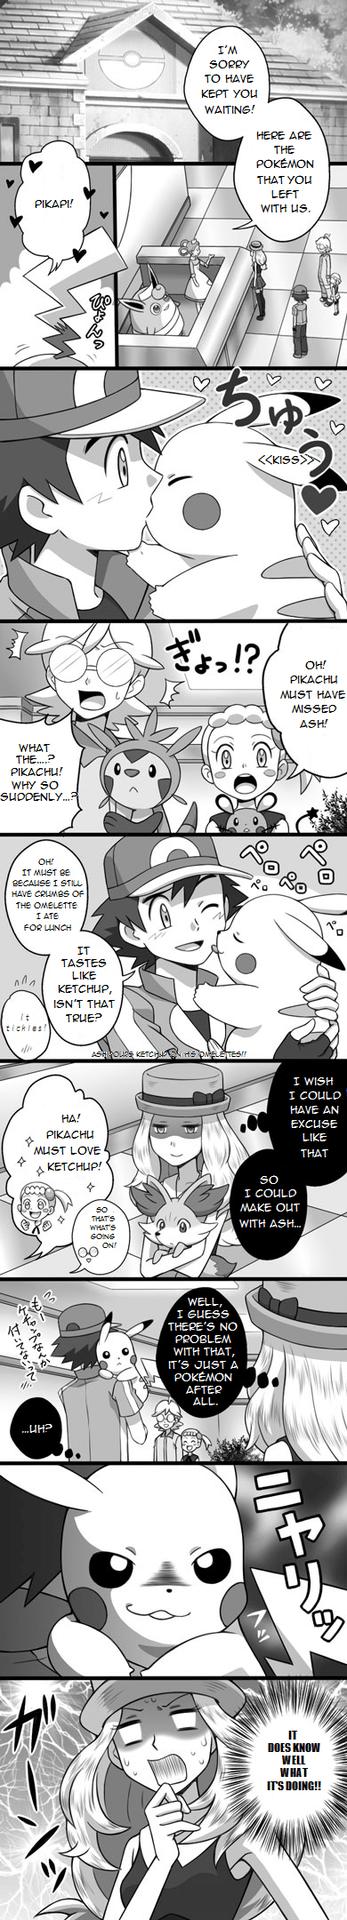 Pikachu is Making Me Feel Incredibly Uncomfortable